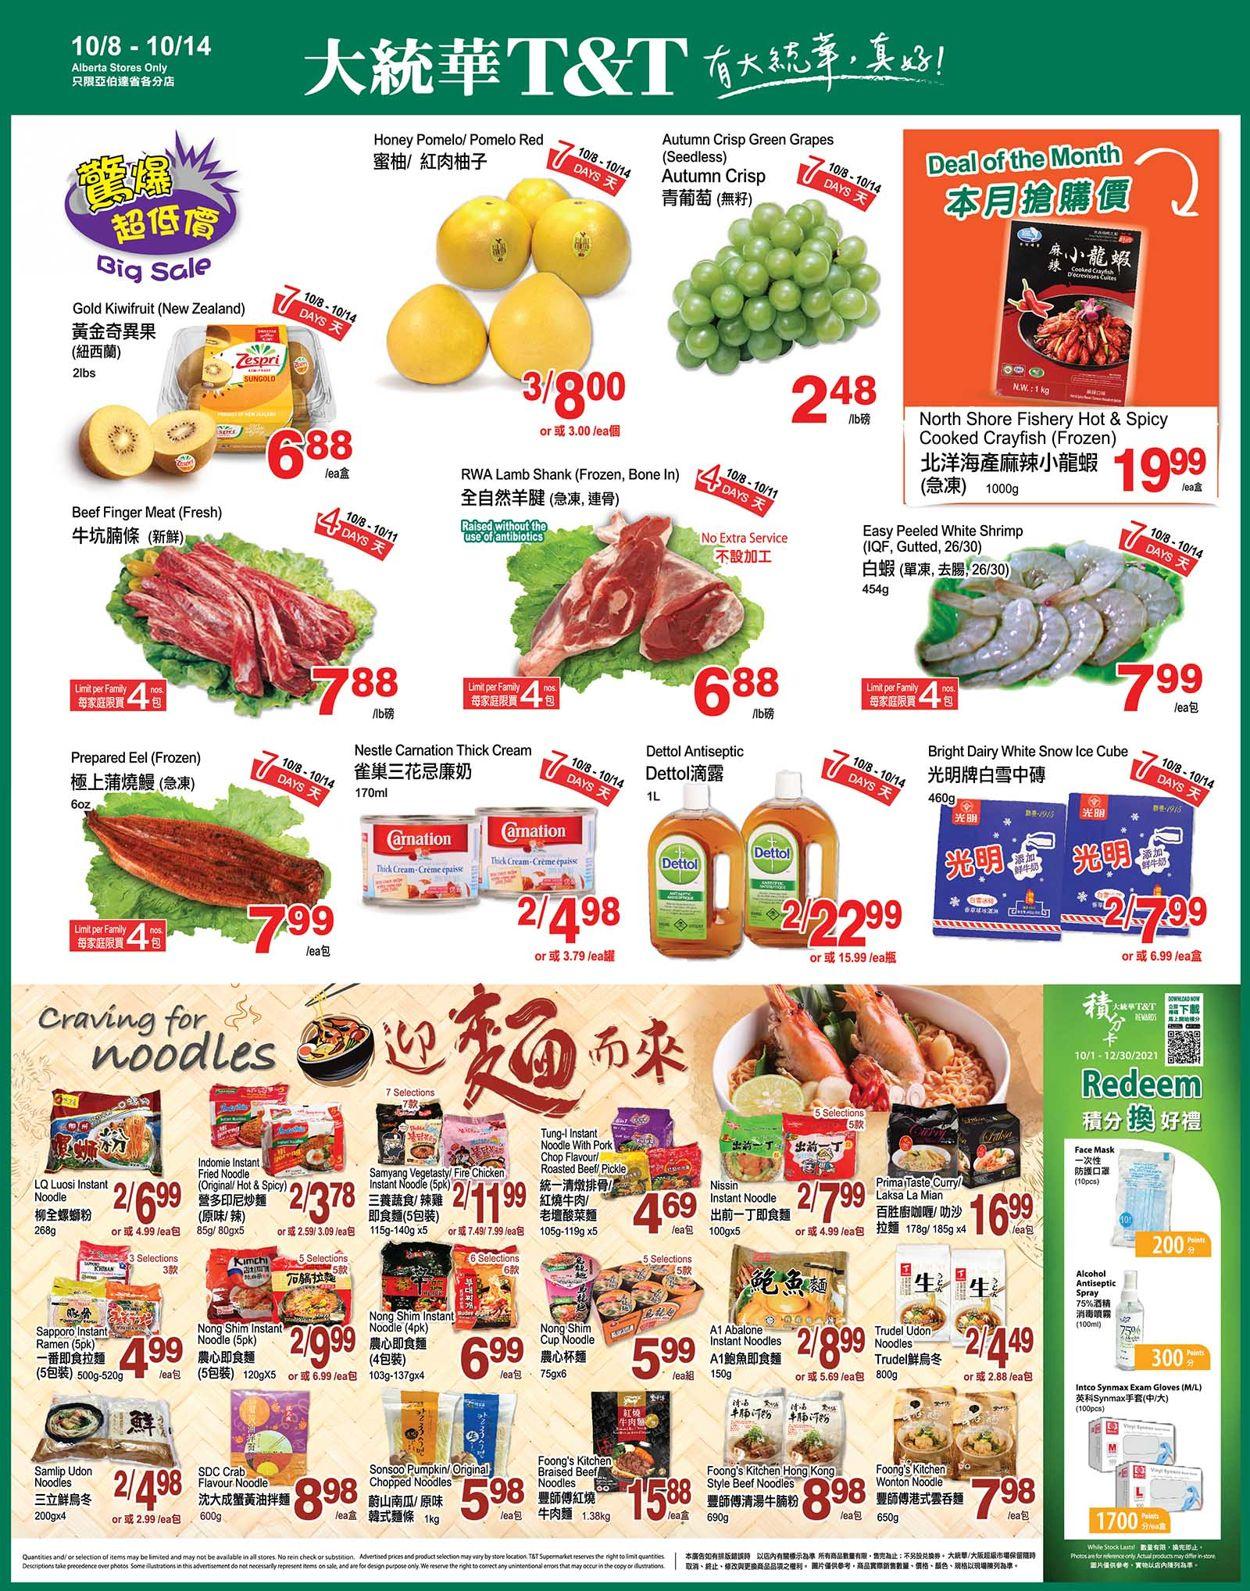 T&T Supermarket - Alberta Flyer - 10/08-10/14/2021